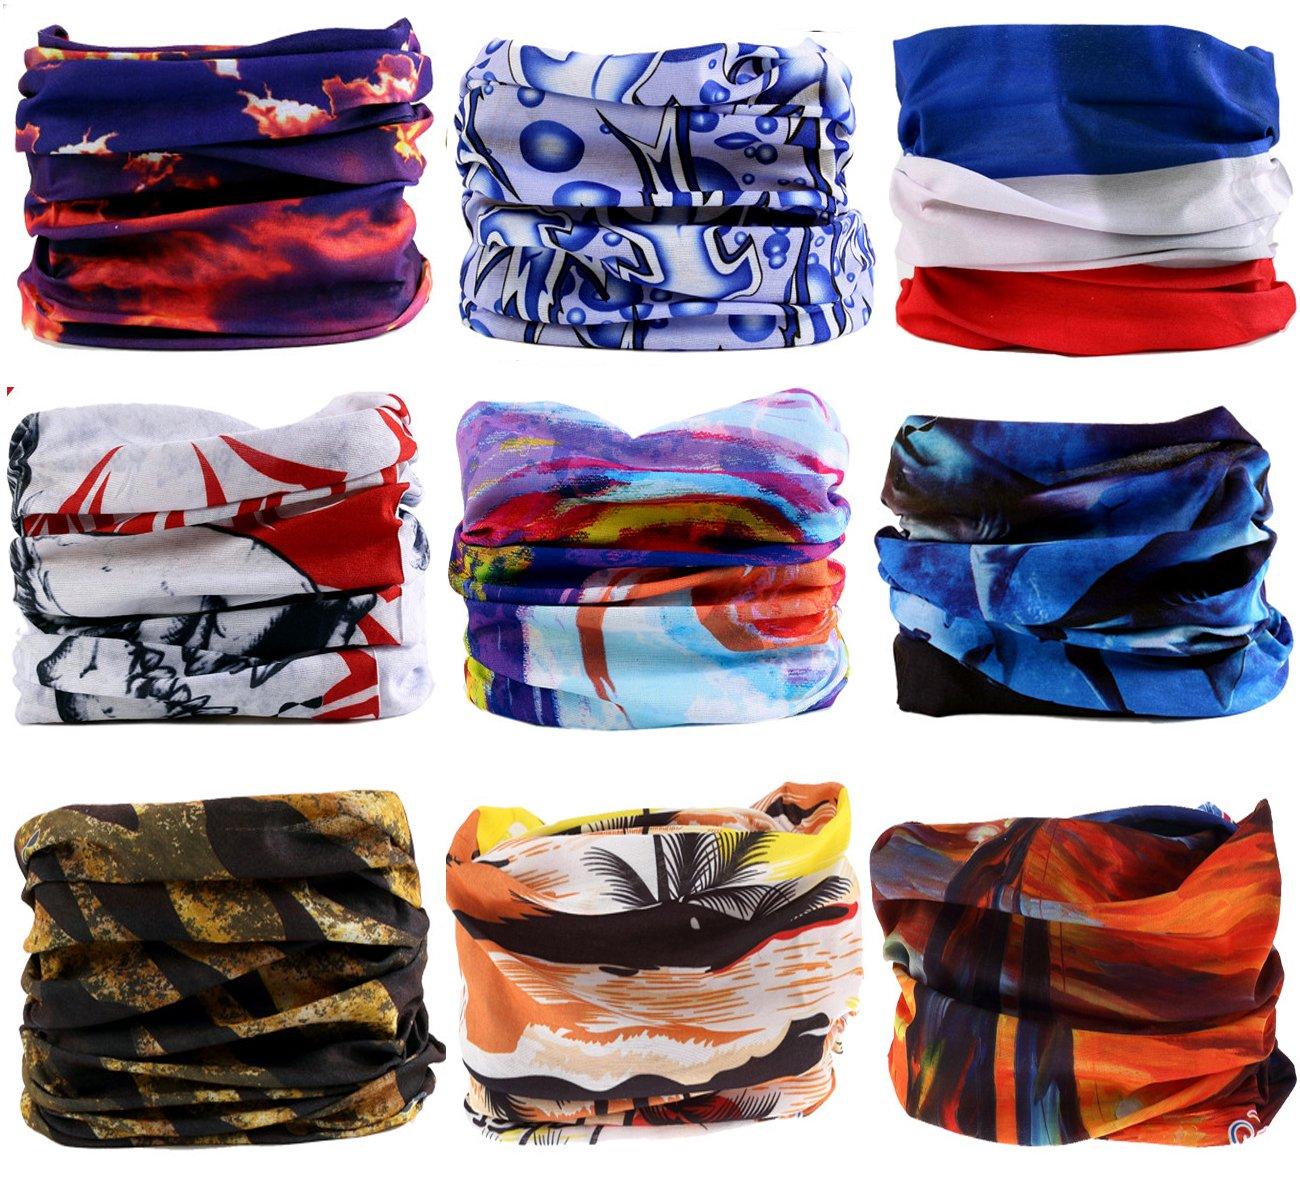 KINGREE 9PCS Headbands Womens Hairband Outdoor Multifunctional Headwear Athletic Headwrap Sports Magic Scarf Mens Sweatband High Elastic Headband with UV Resistance